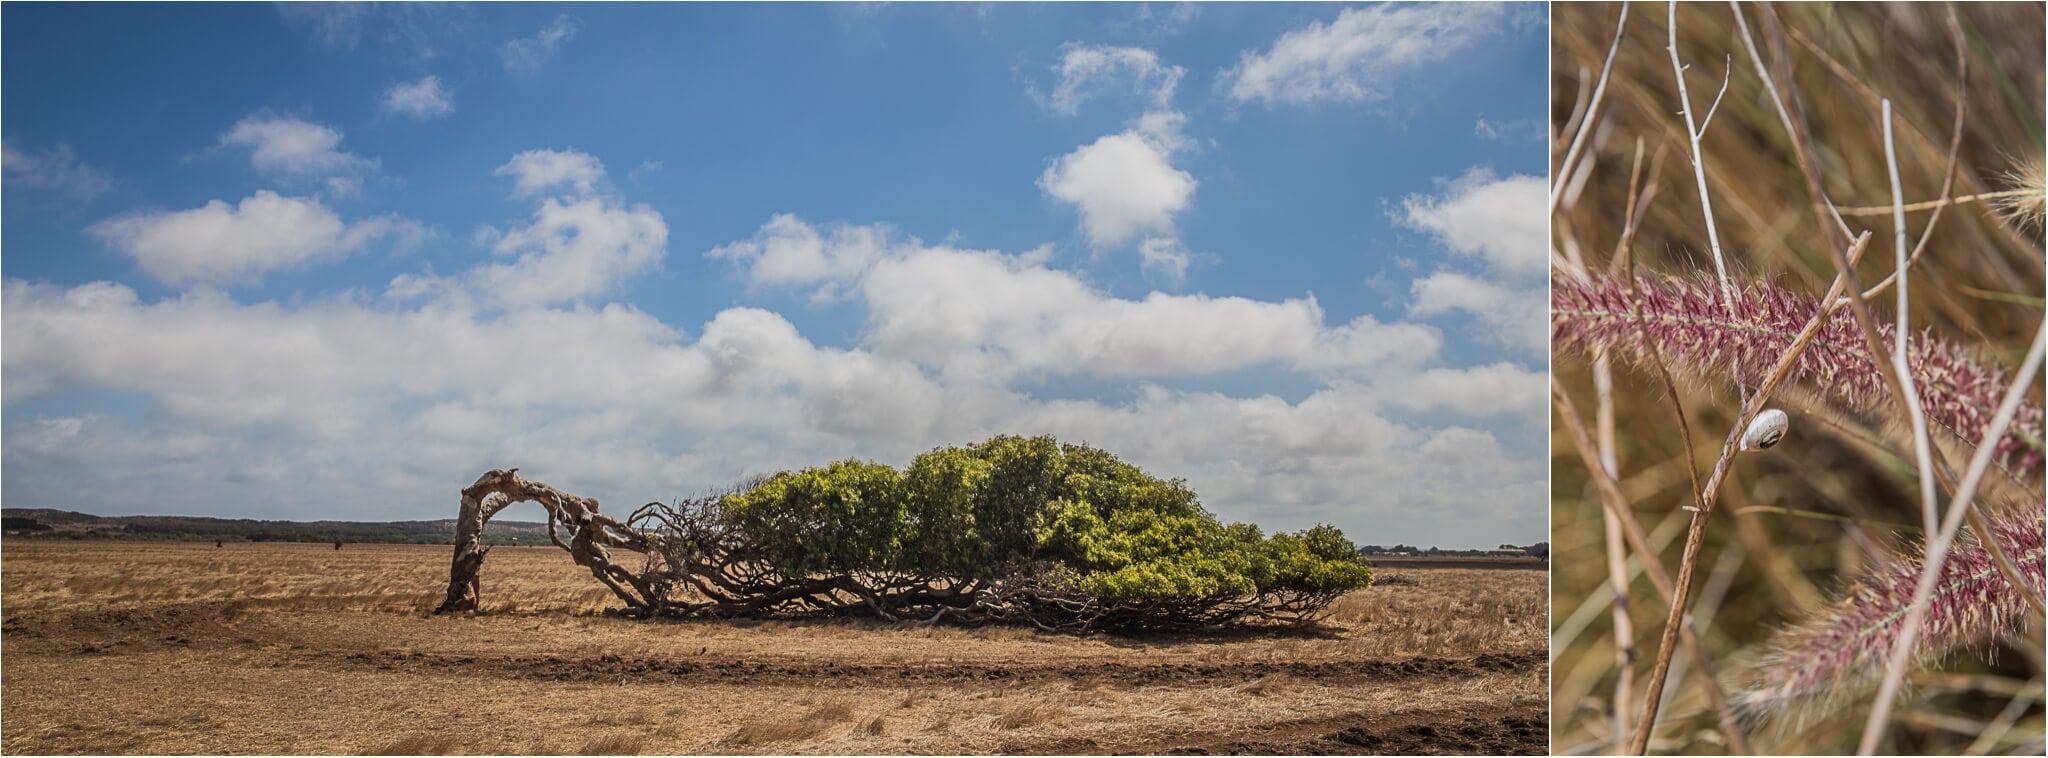 Leaning Tree, Australia, Wirnda Ngadara